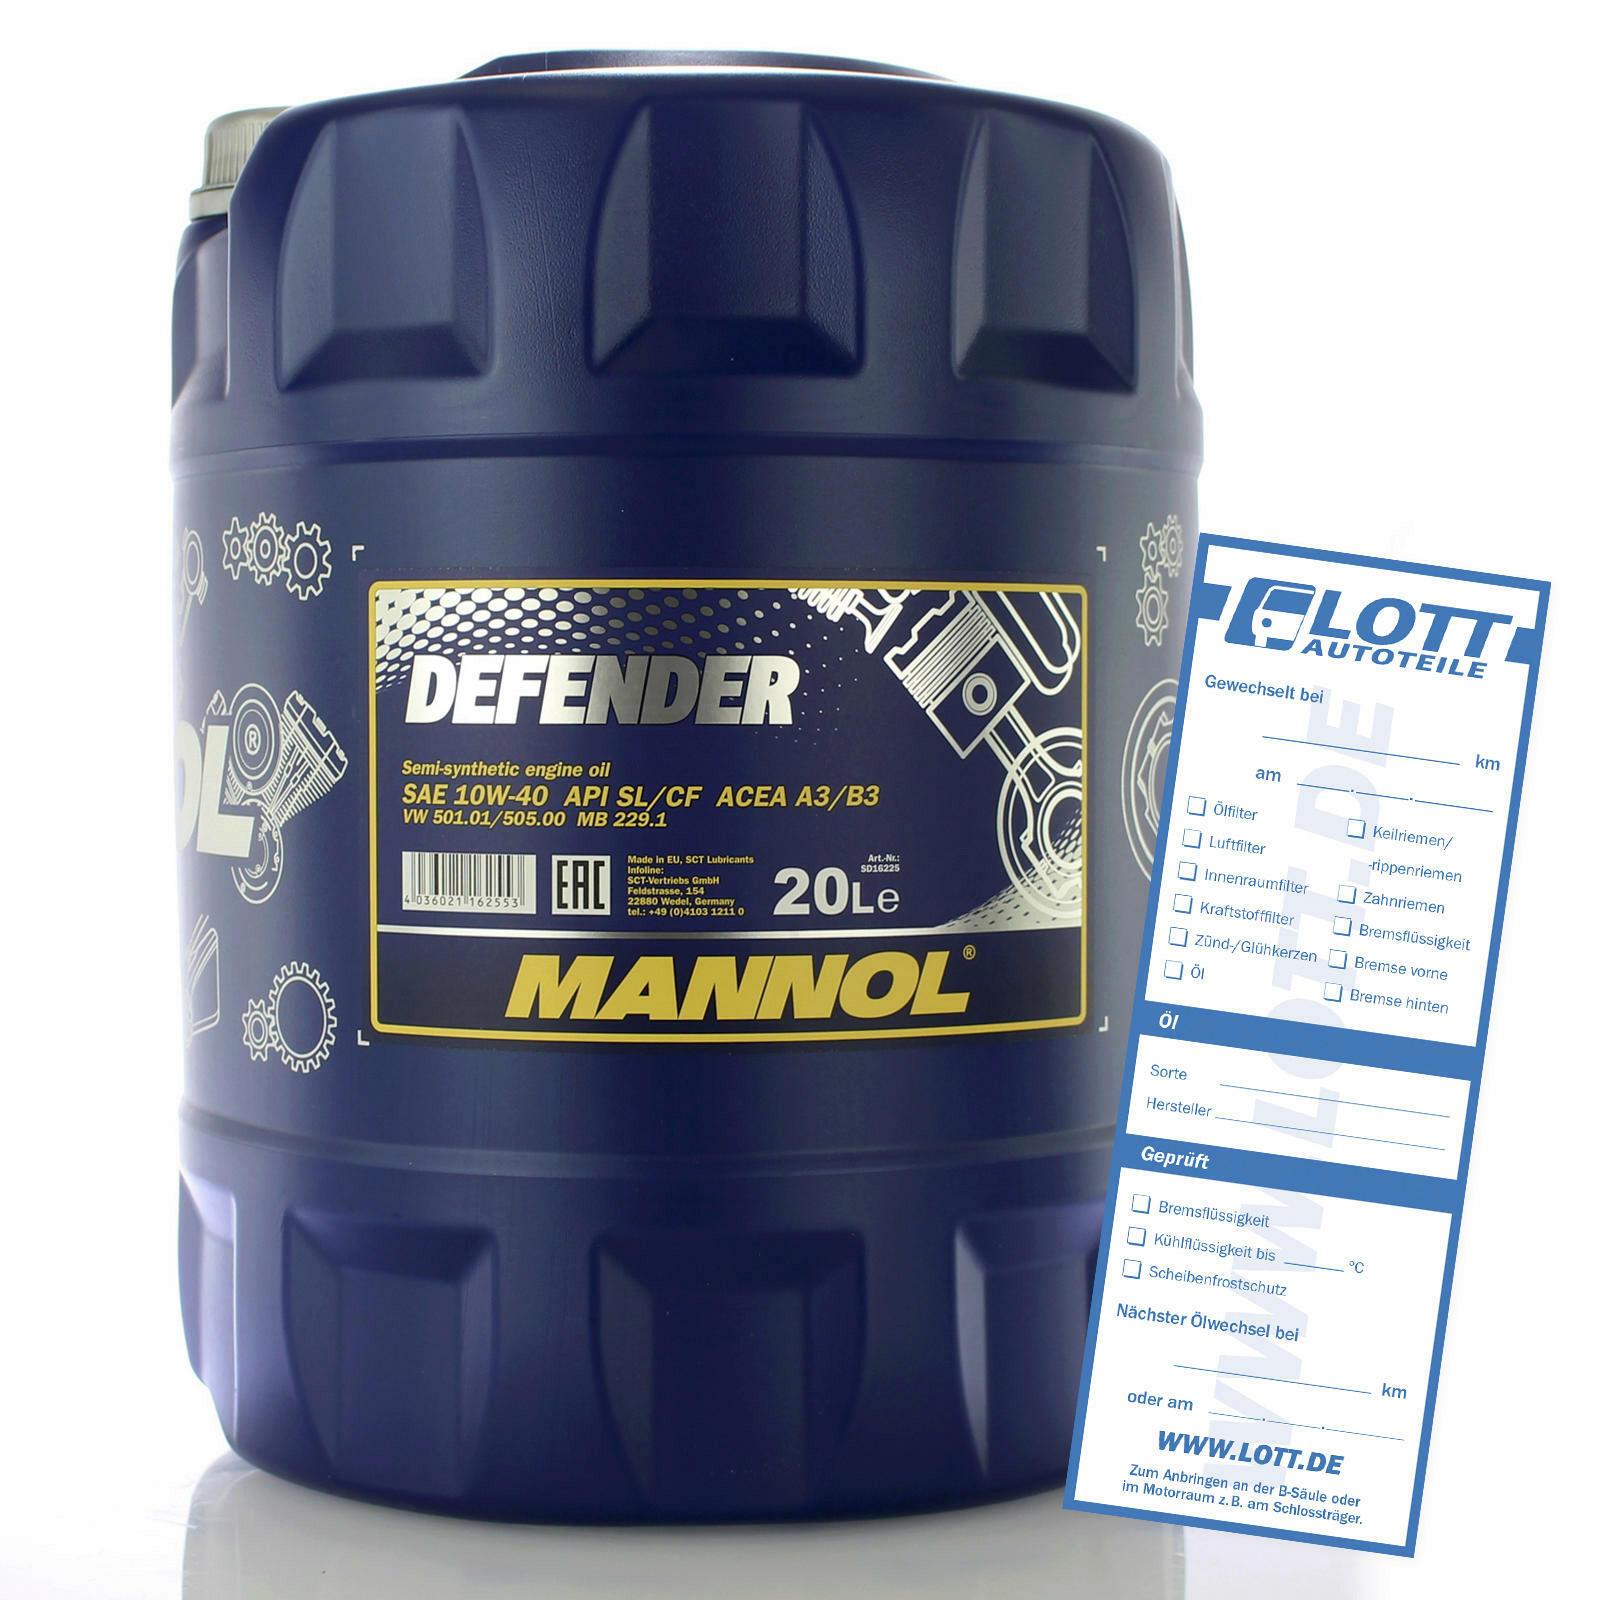 Mannol Defender 10W-40 20L